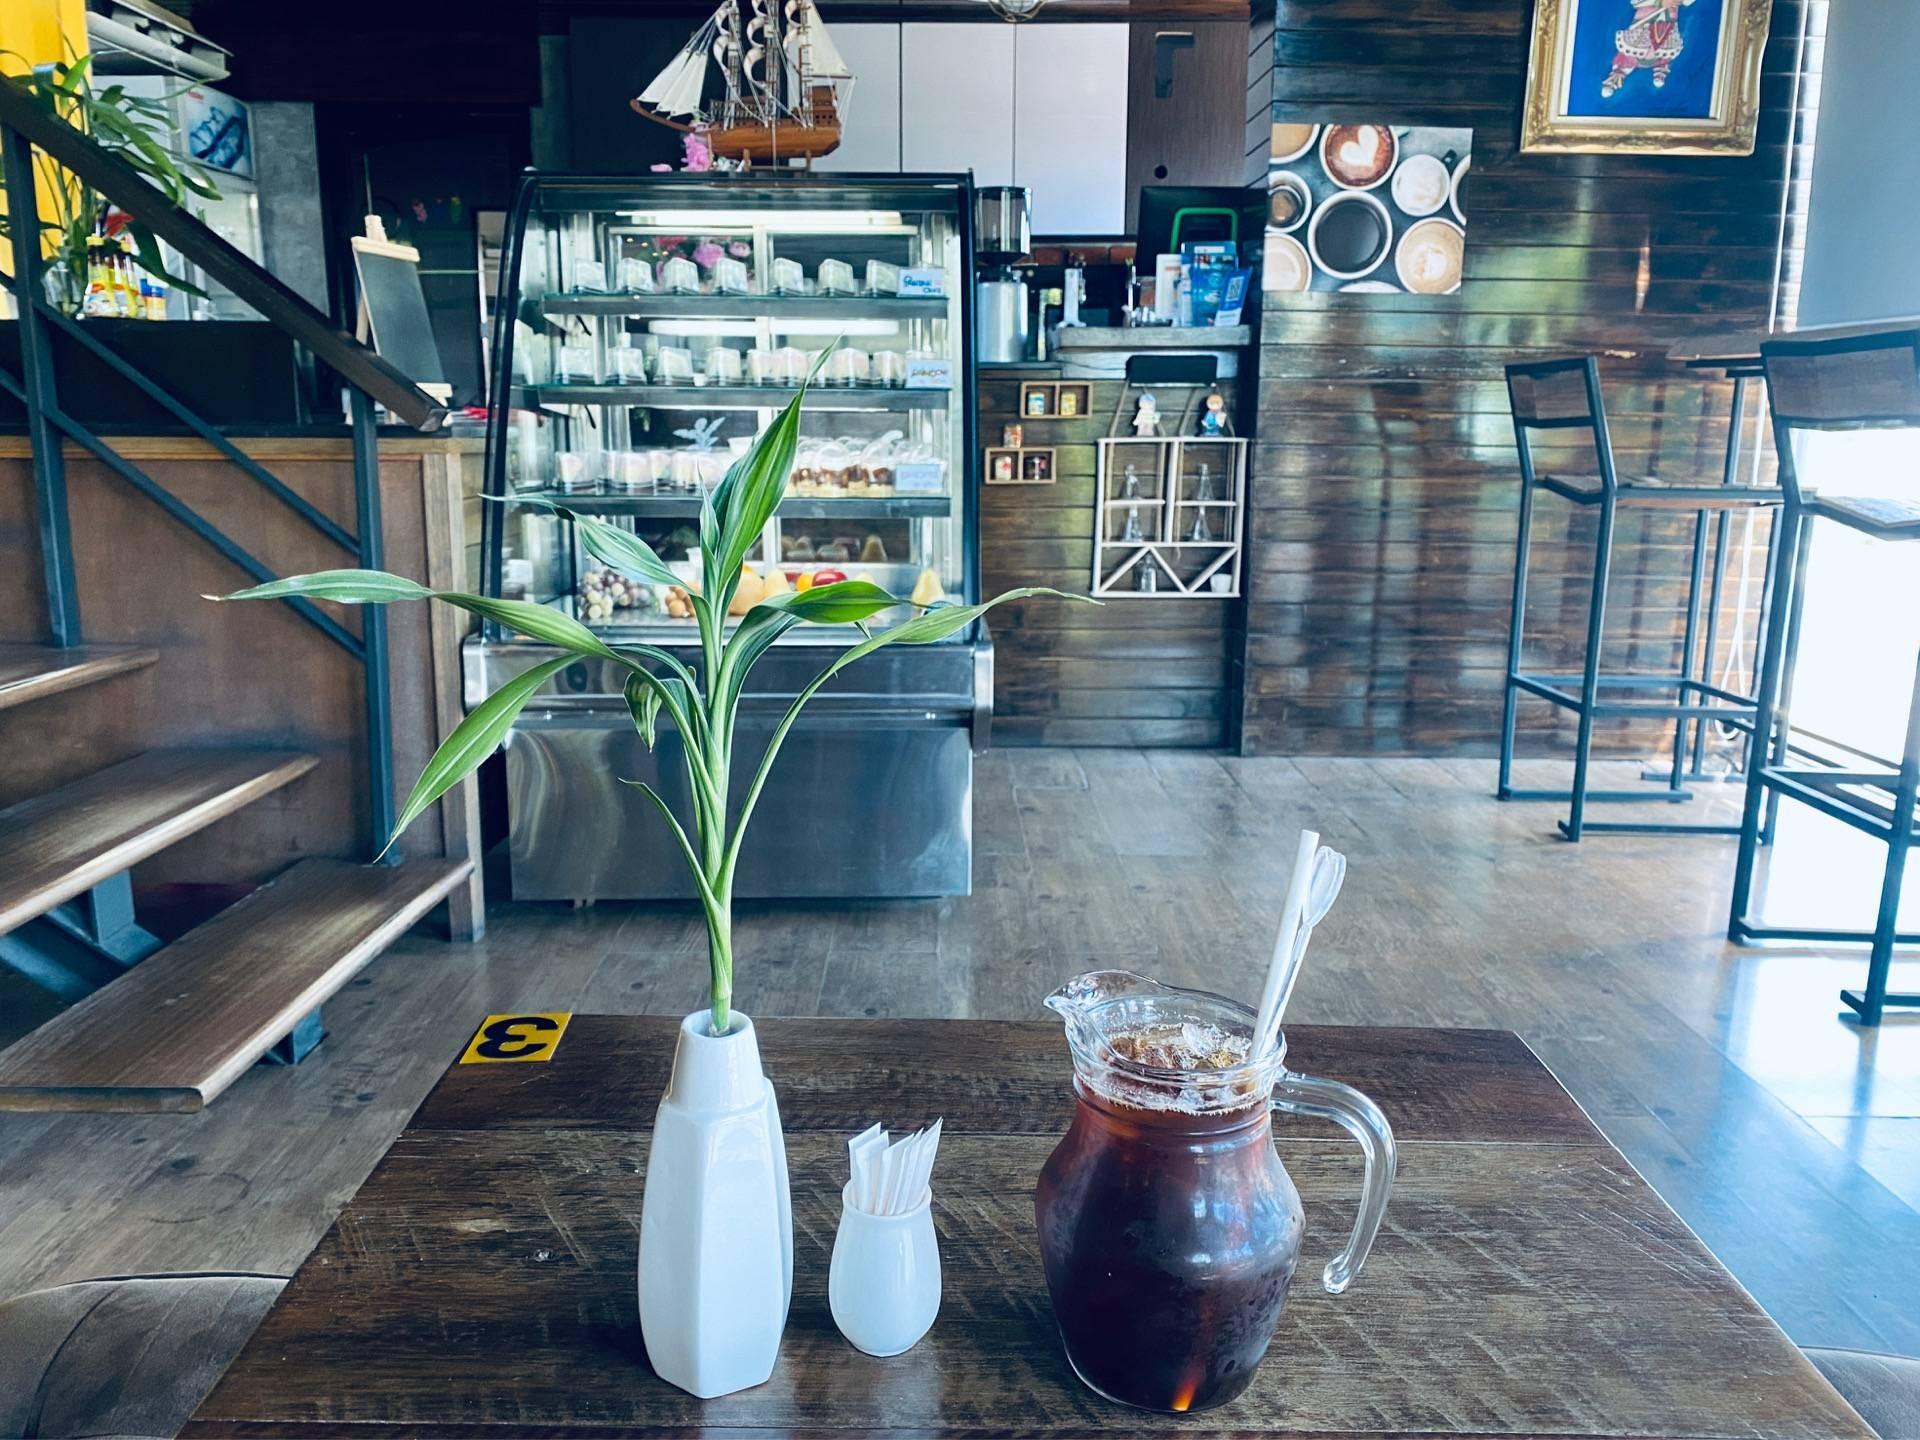 THE LITTLE PHUKET COFFEE & CUISINE